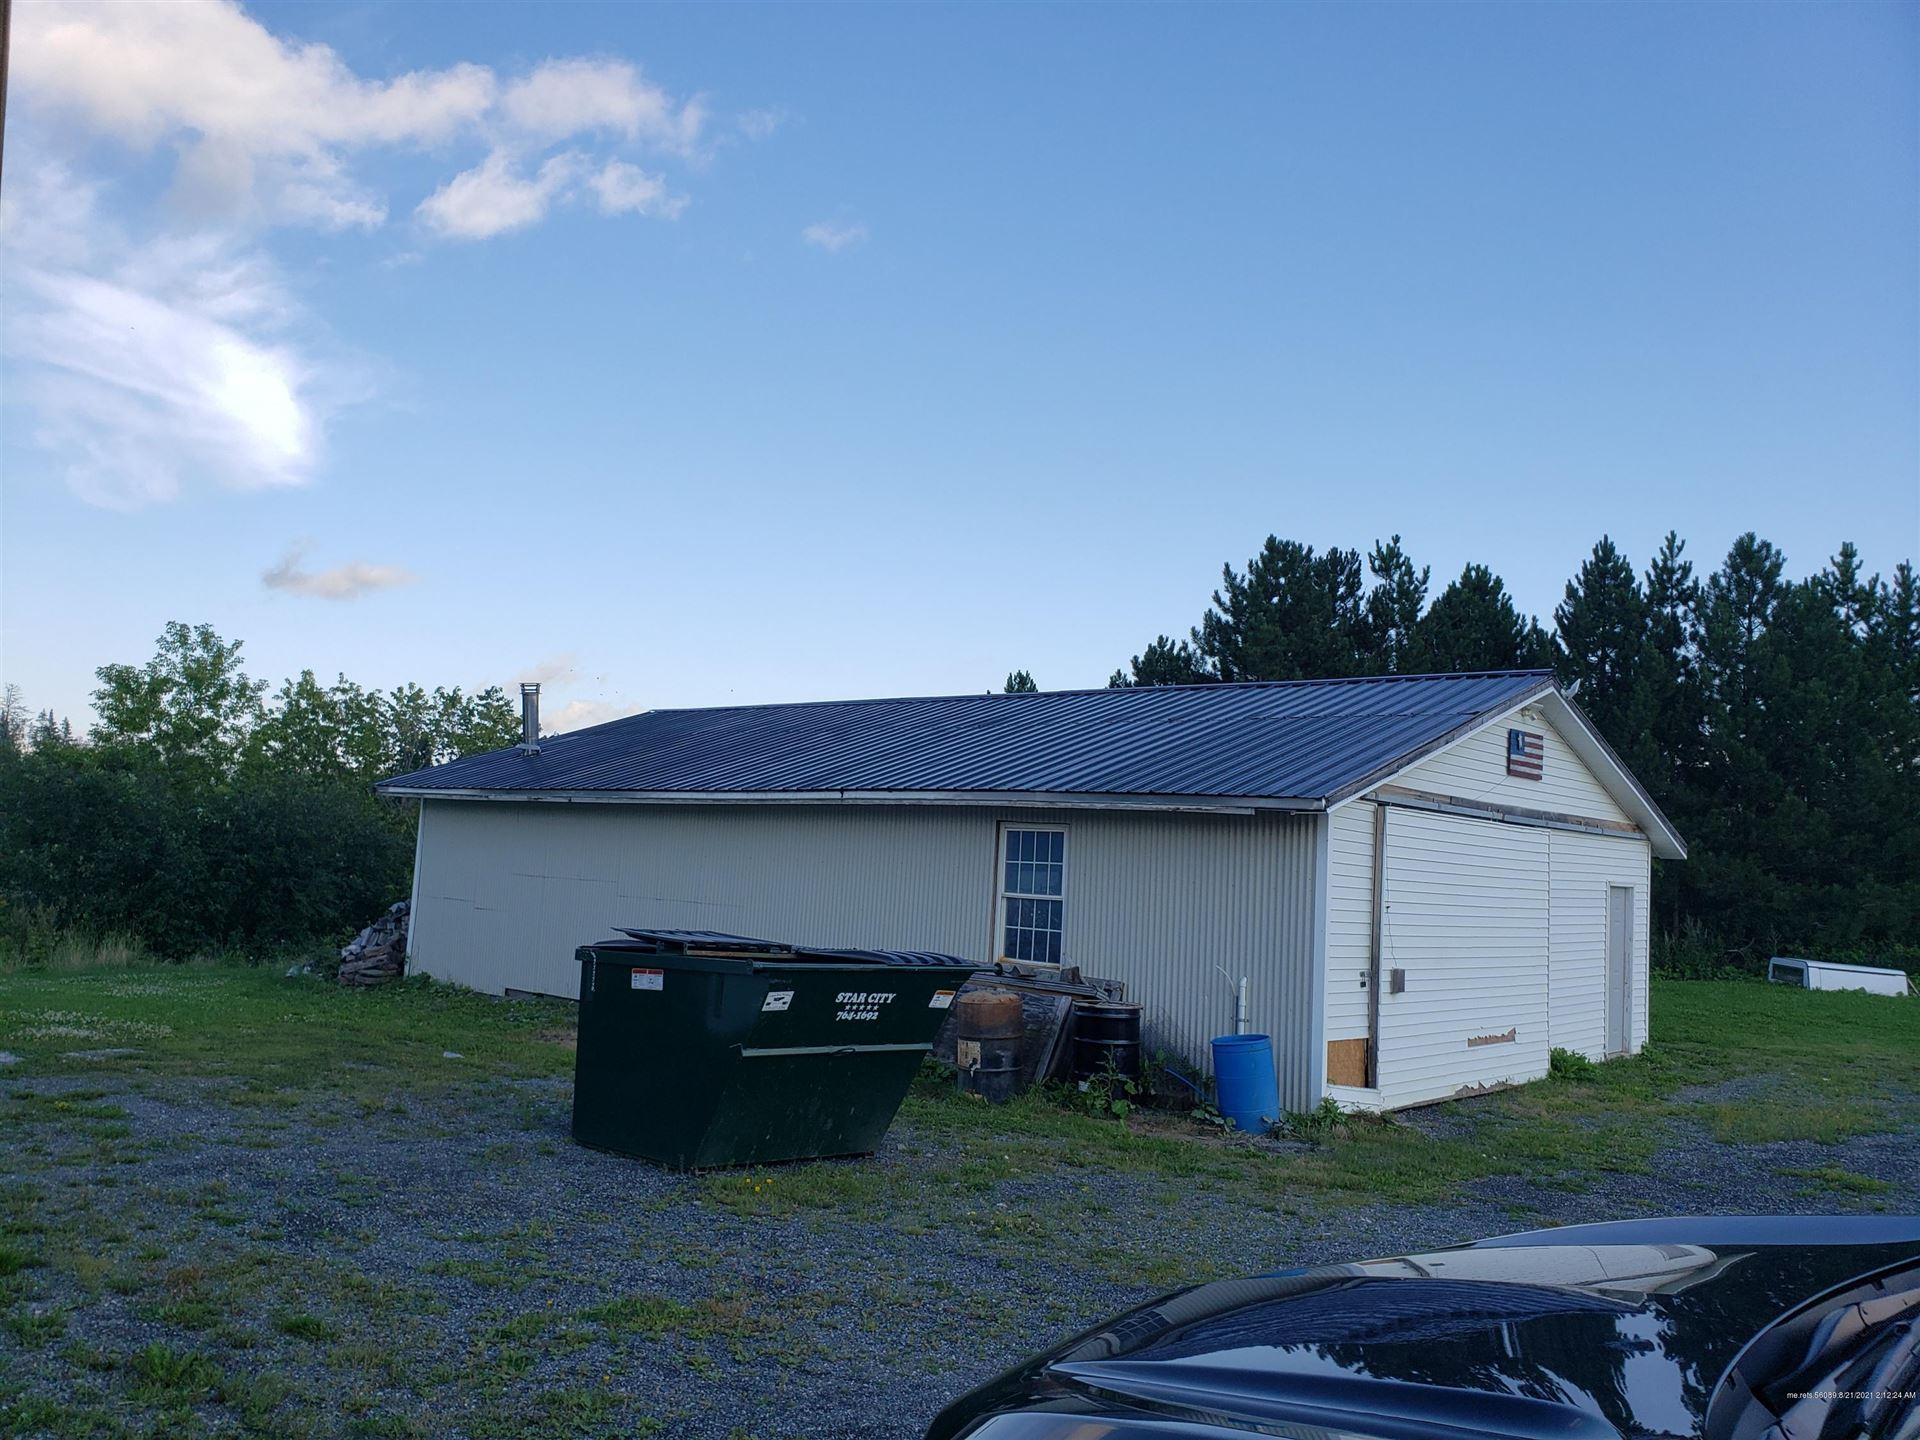 Photo of 200 Parsons Road, Presque Isle, ME 04769 (MLS # 1505361)